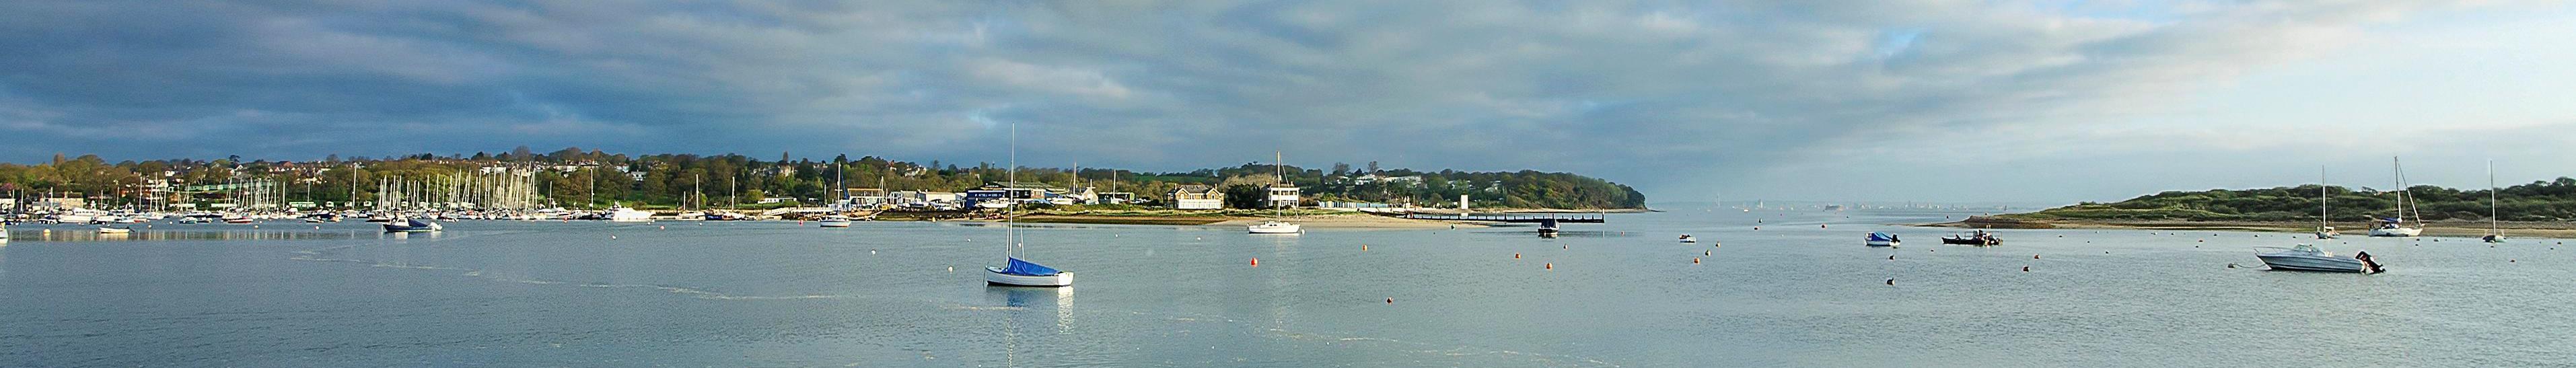 Bembridge_banner_Bembridge_Harbour